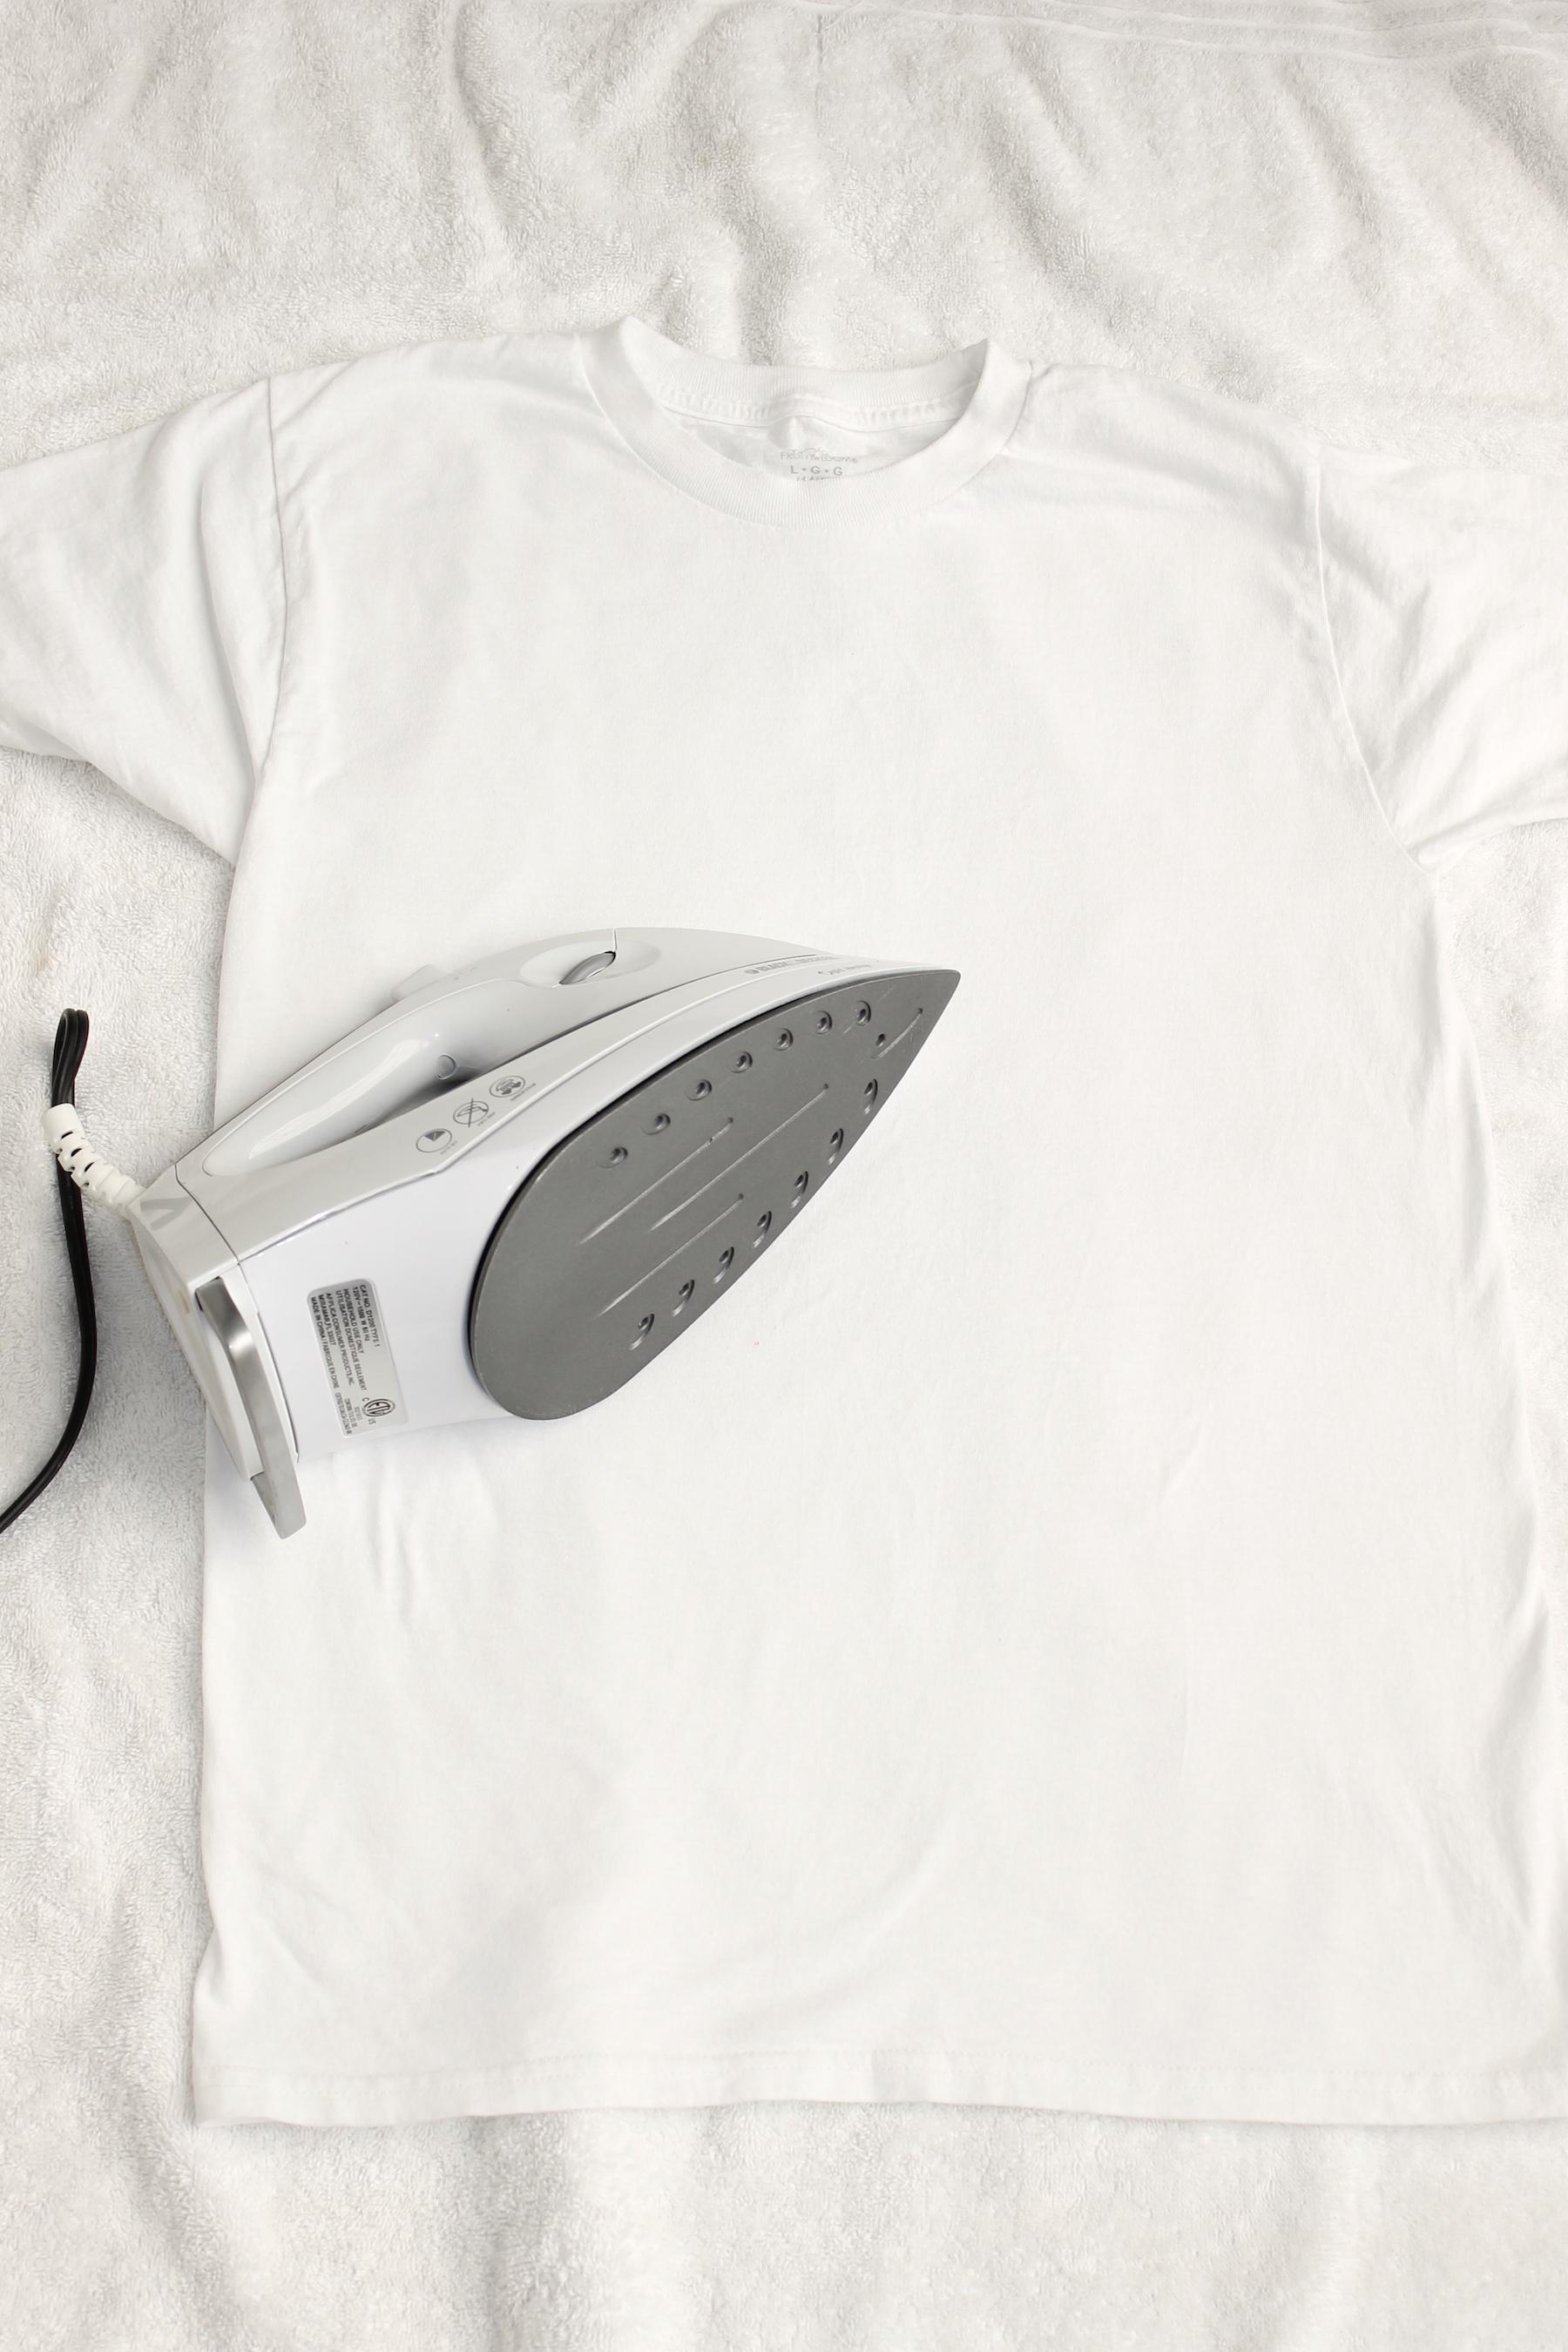 DIY 4th of july t shirt; handmadebykelly.com; onlinelabels.com